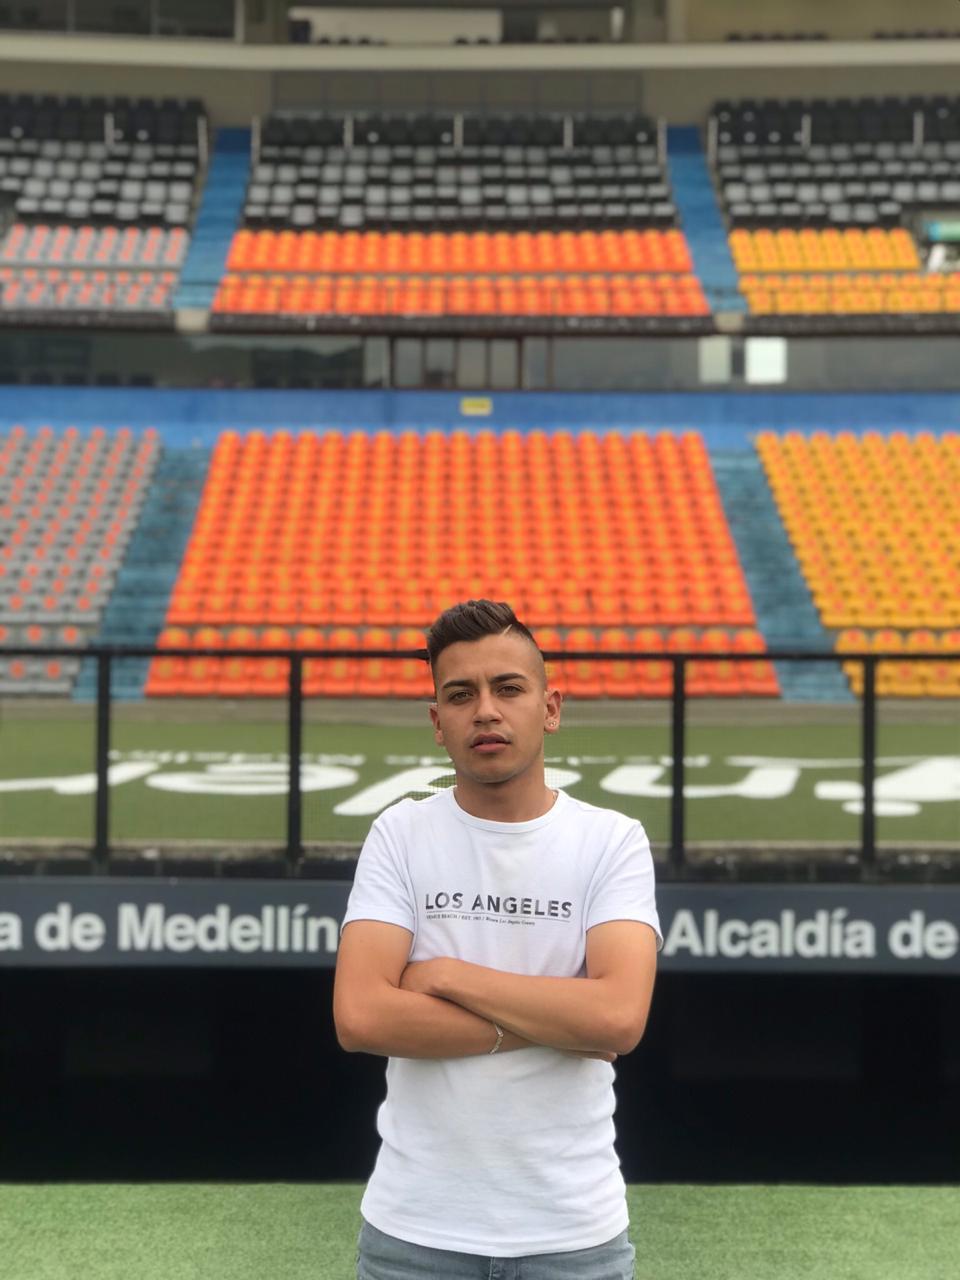 Juan Camilo Panneflek